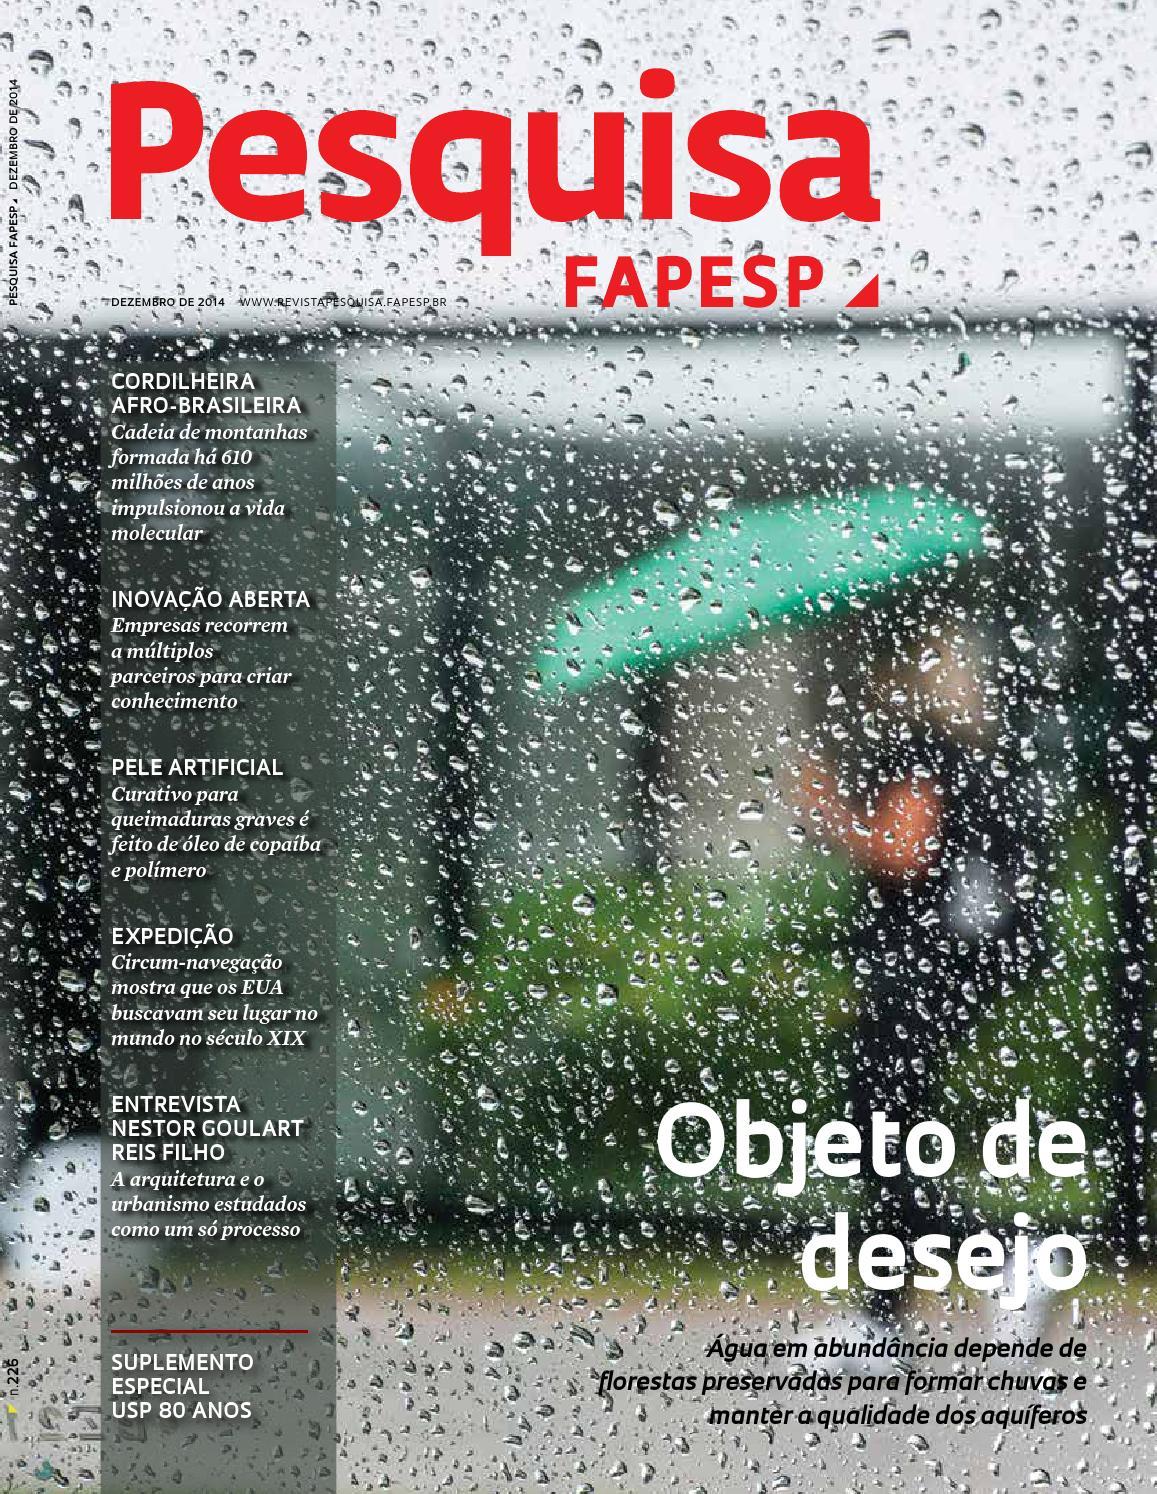 Pesquisa FAPESP 226 by Pesquisa Fapesp - issuu dc4b5855c4b13